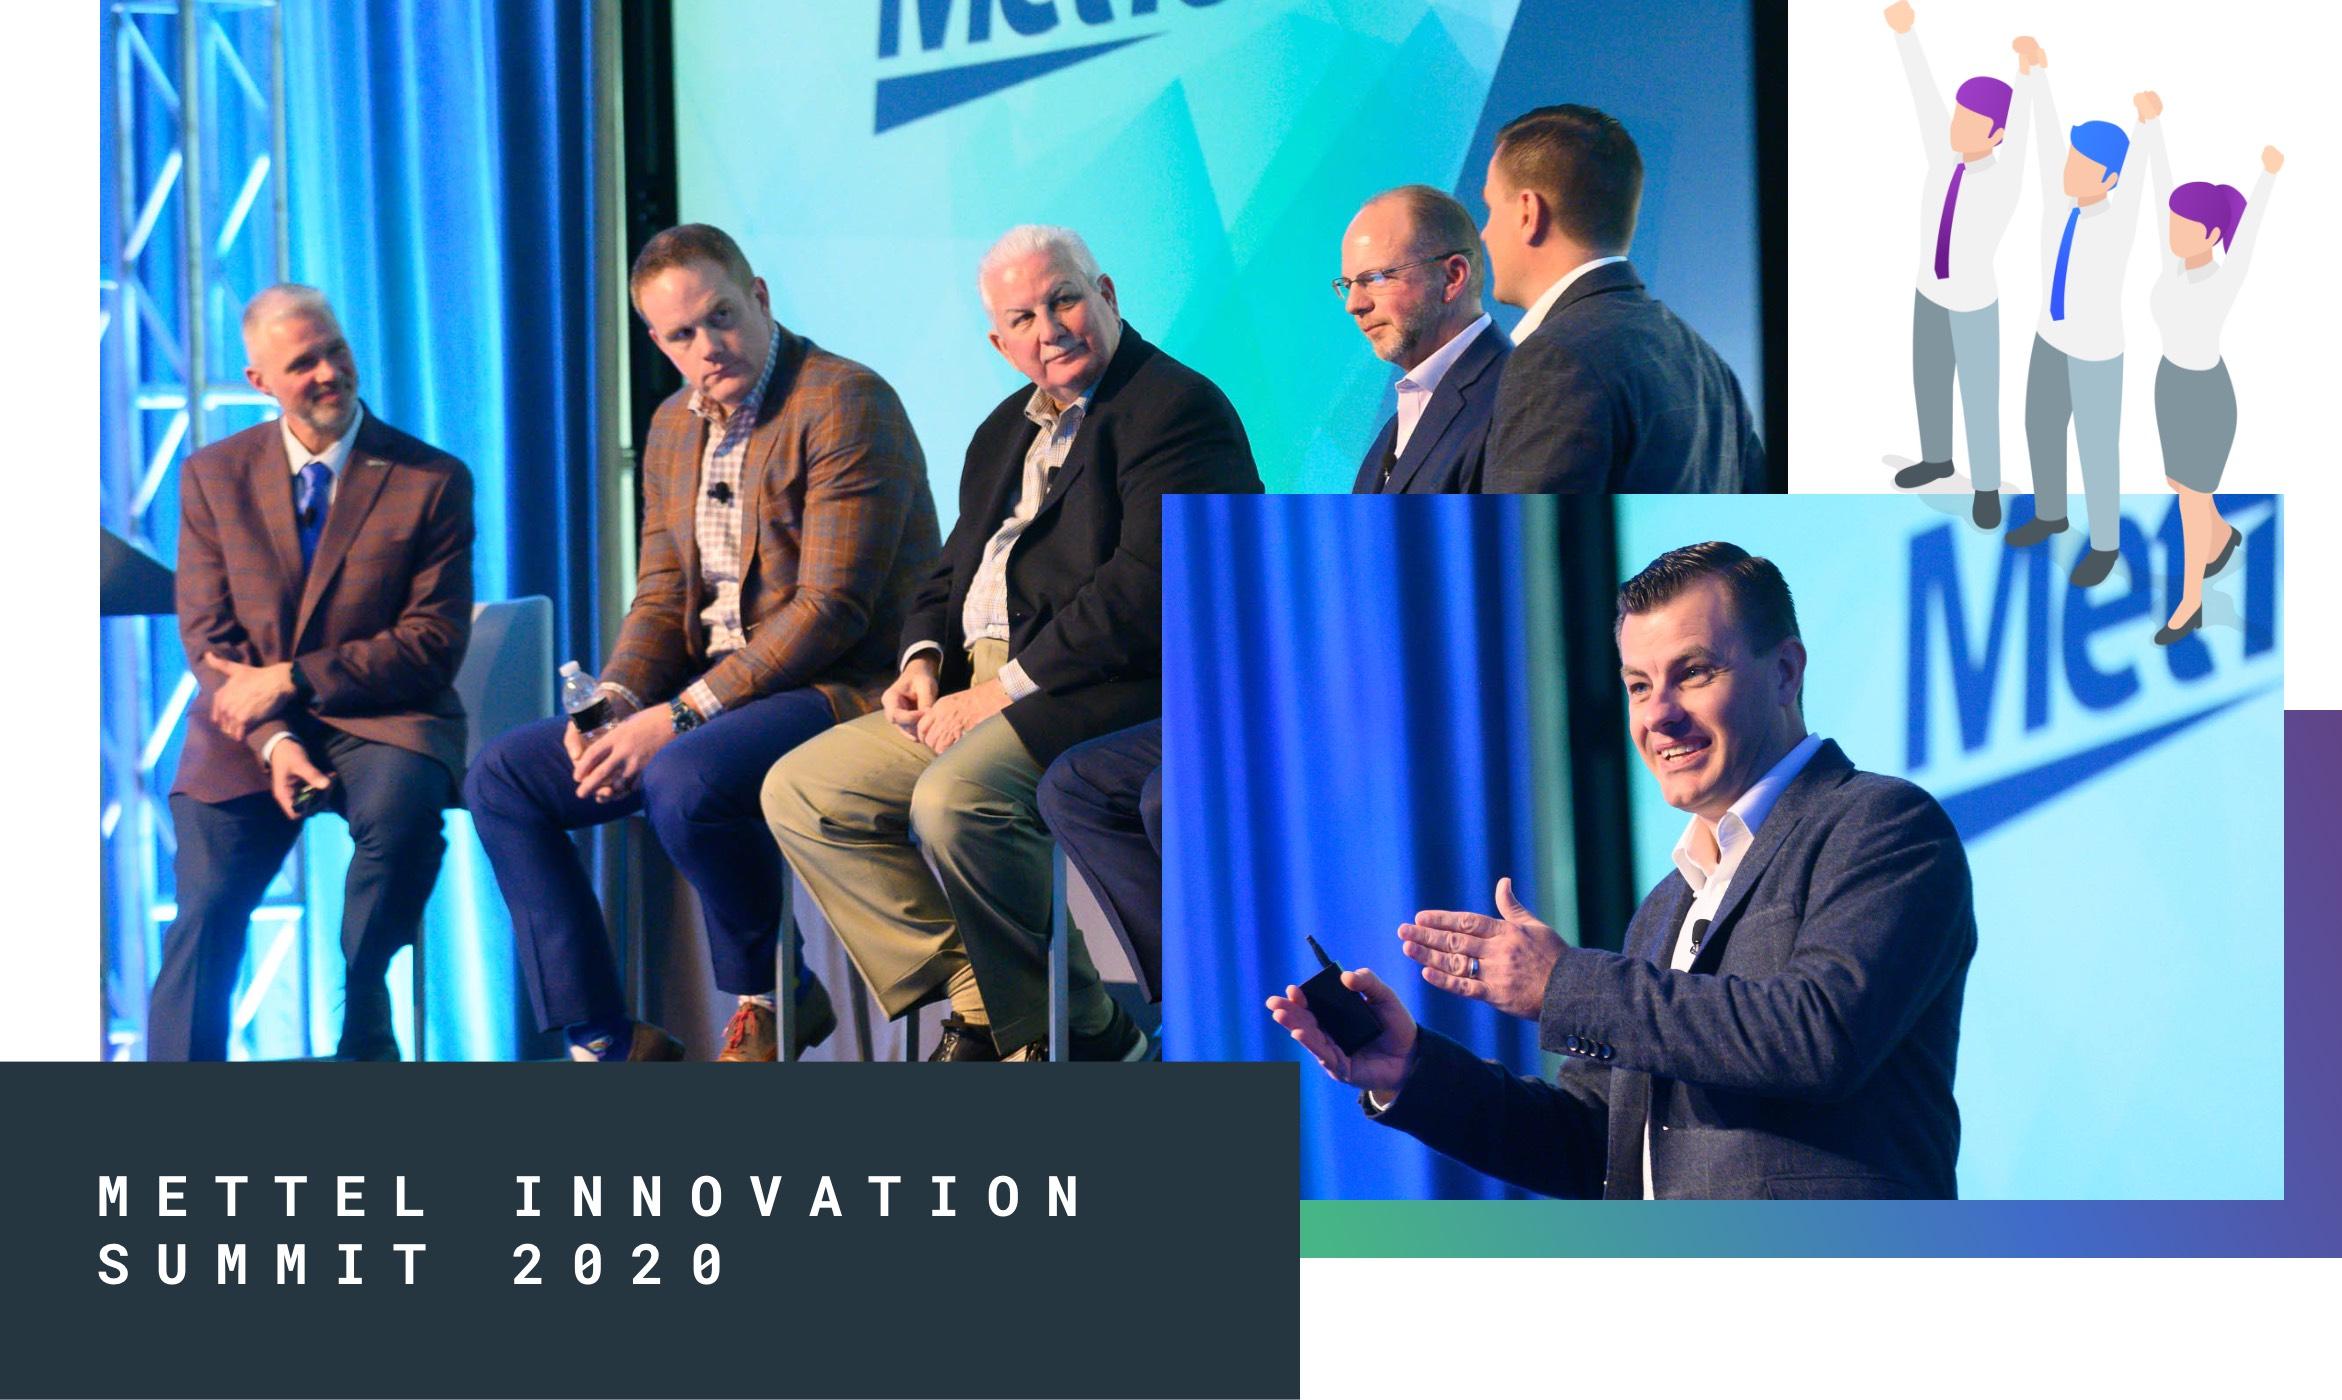 Intelygenz Lab - Mettel Innovation Summit 2020